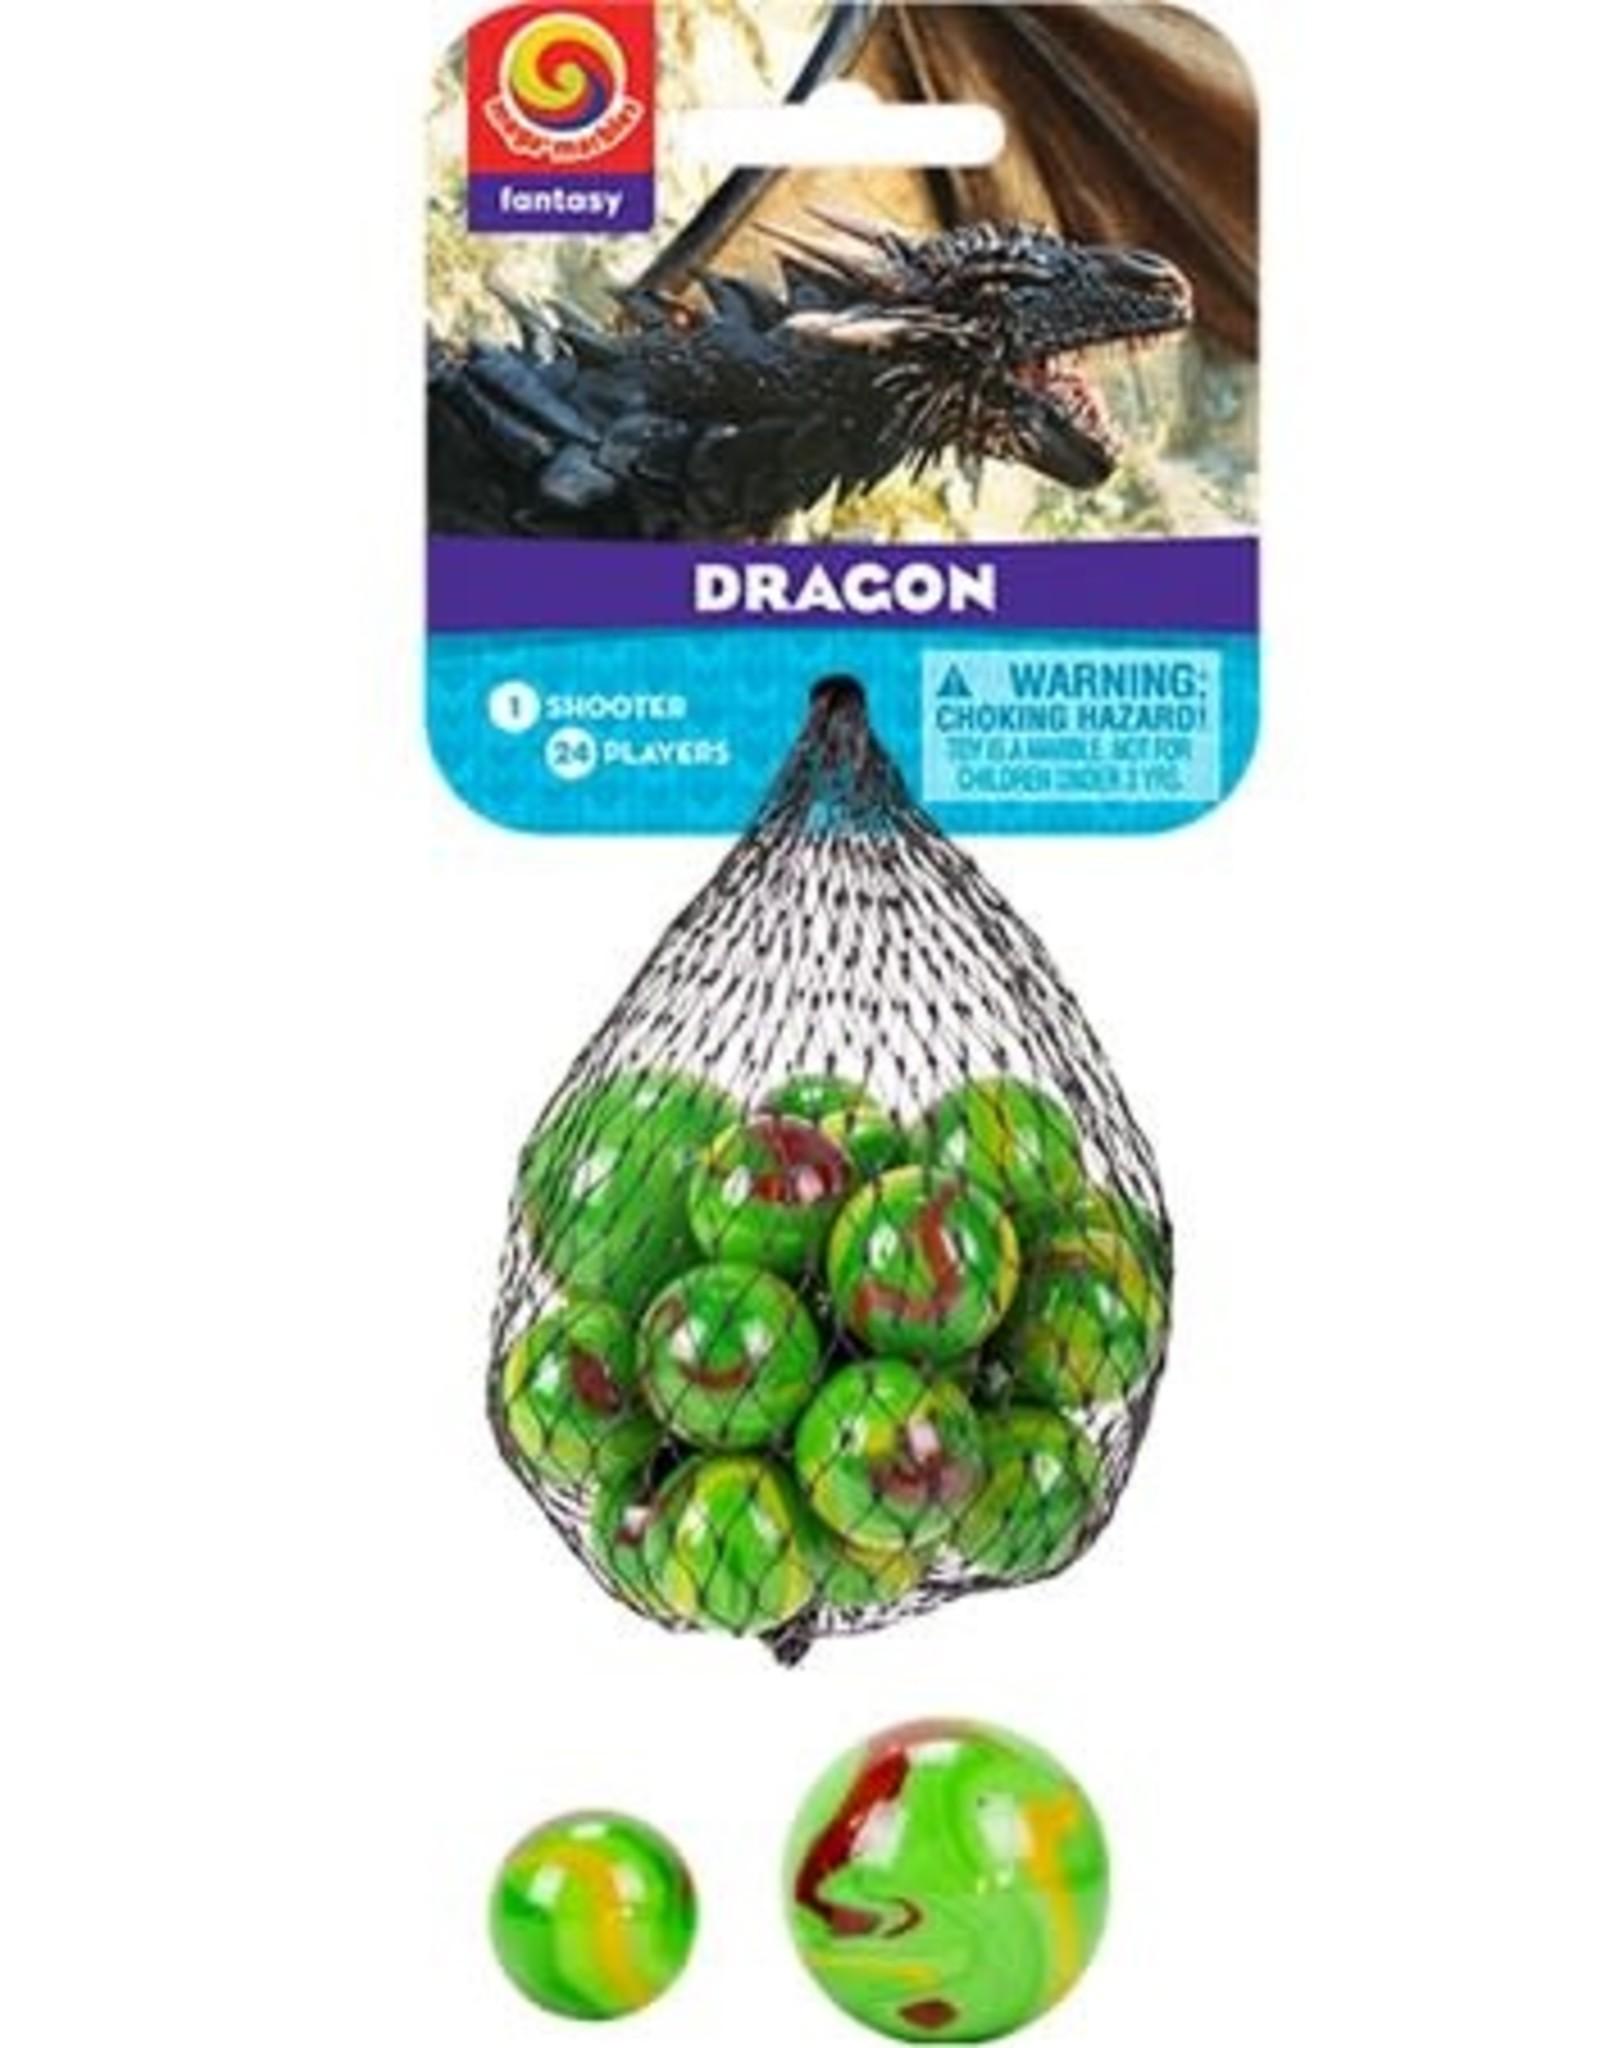 Mega Marbles Marble Game Net Dragon